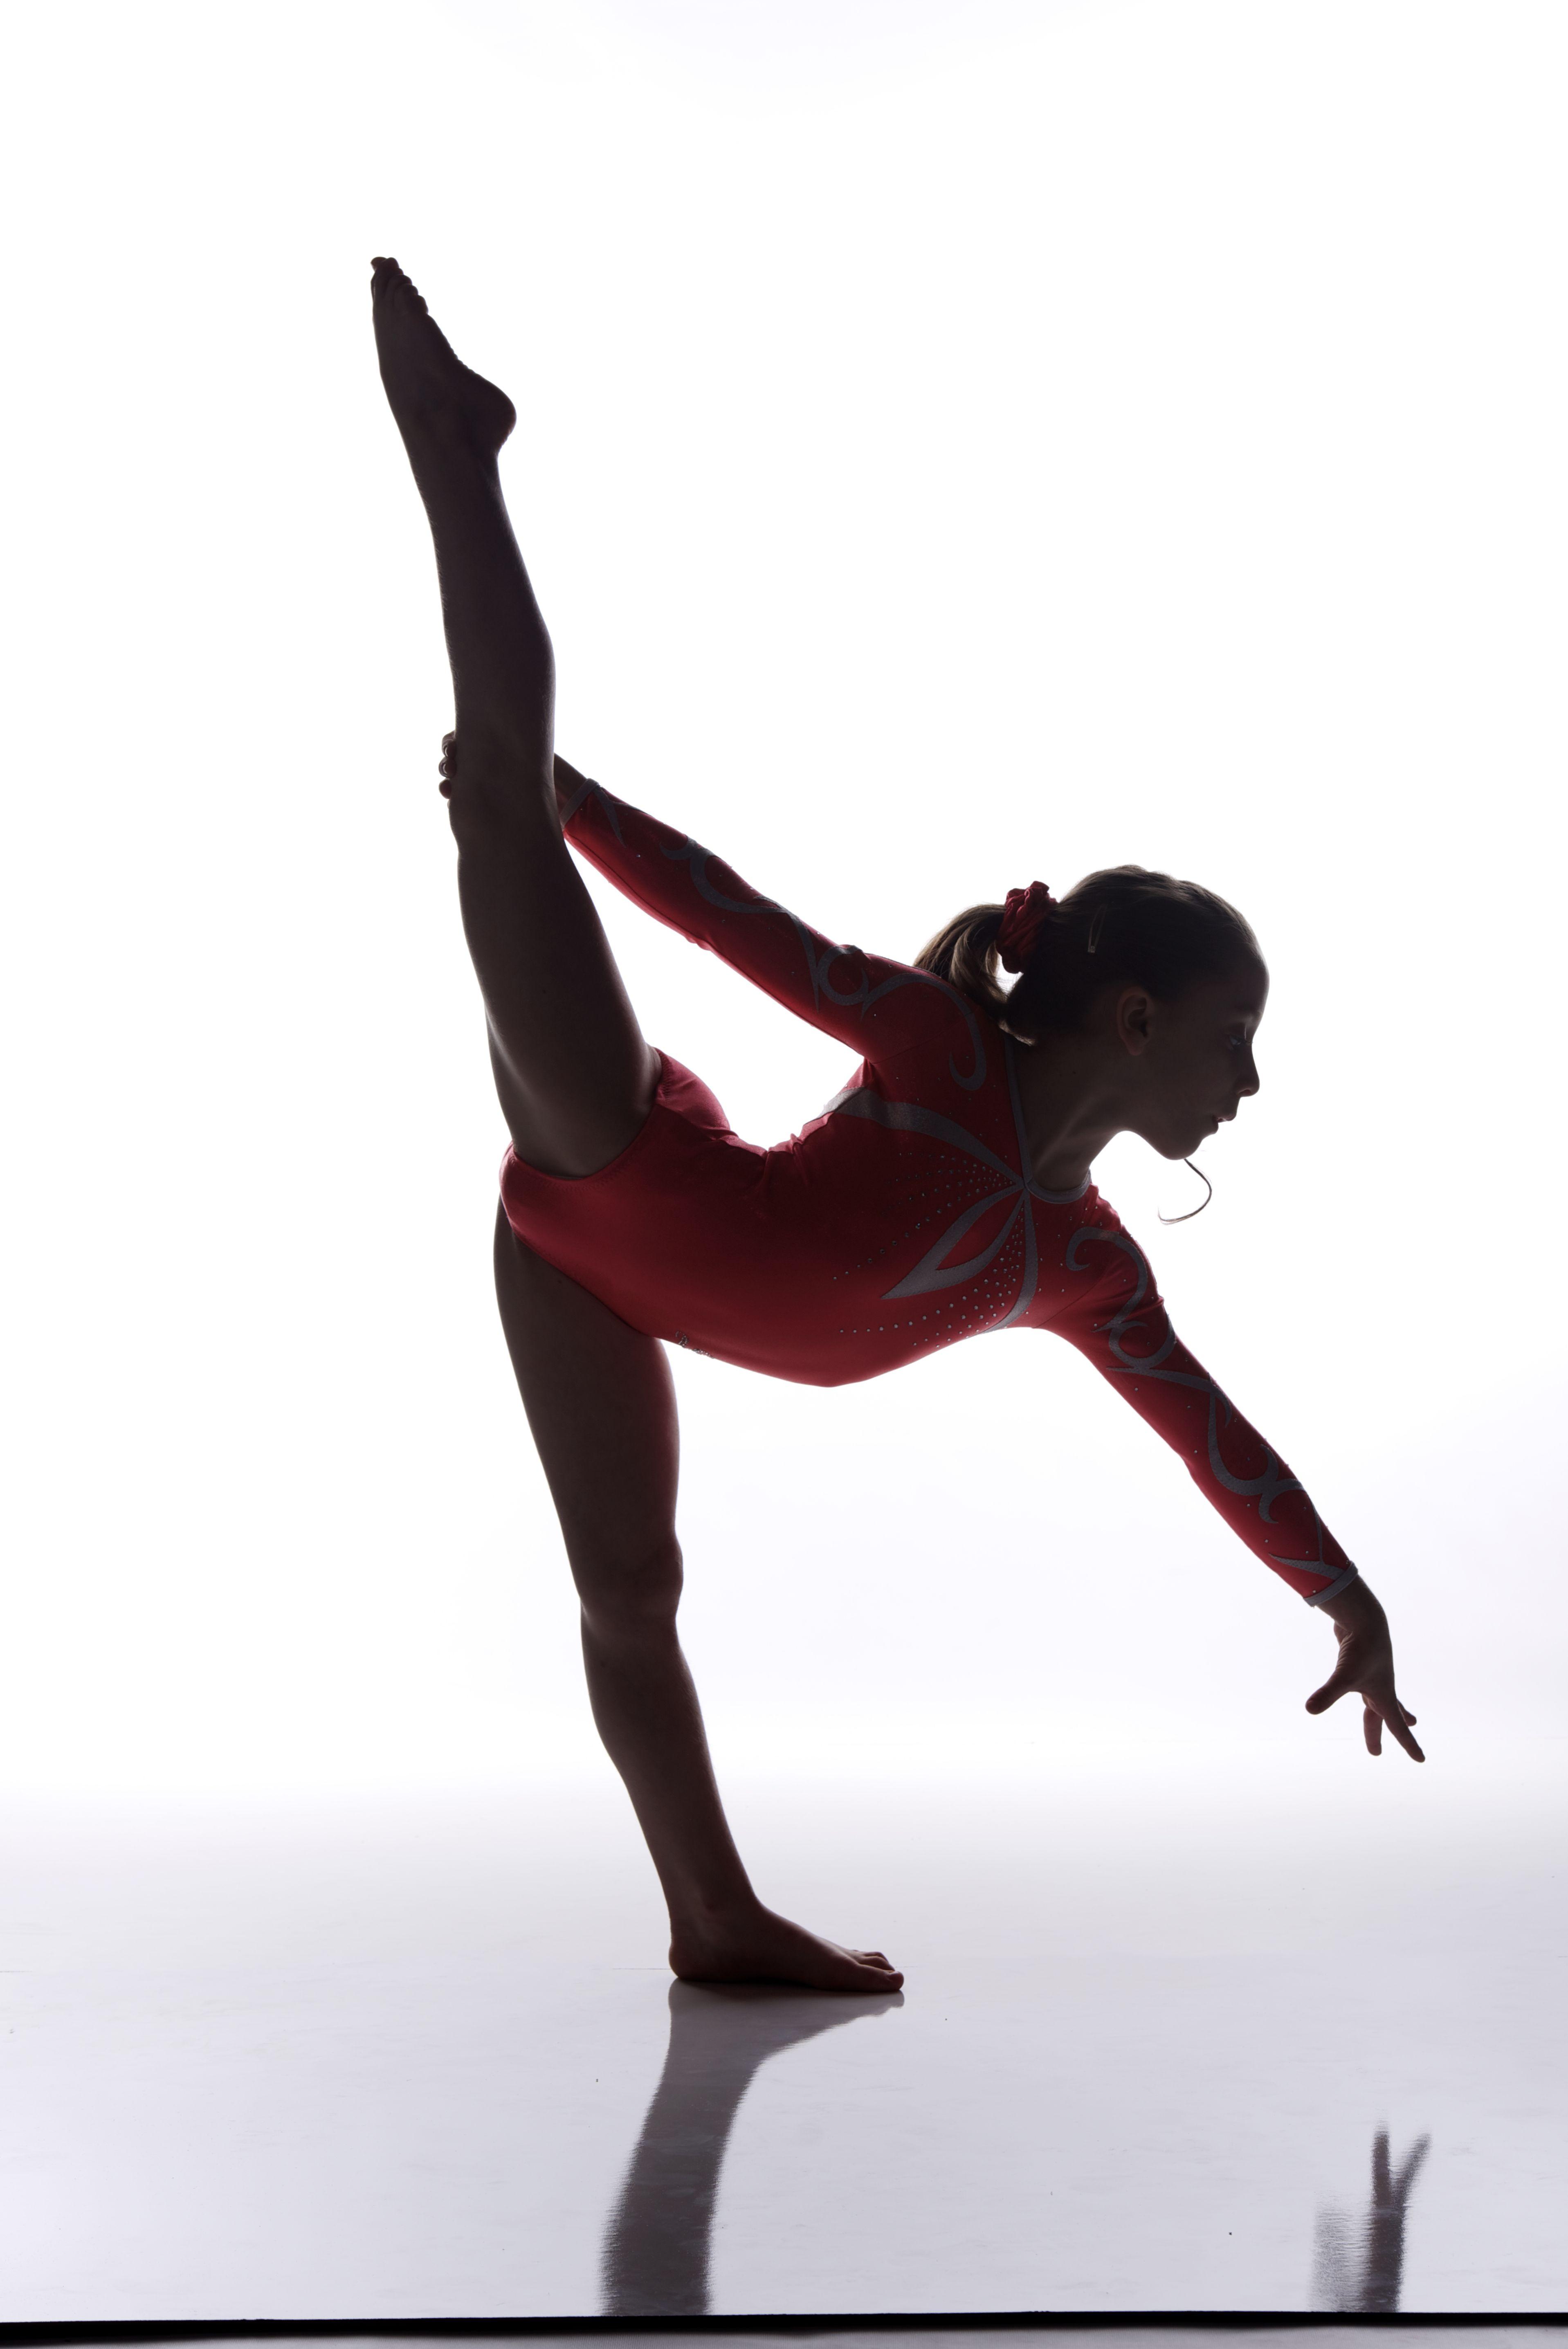 Winwin gymnastics -  Supersyd